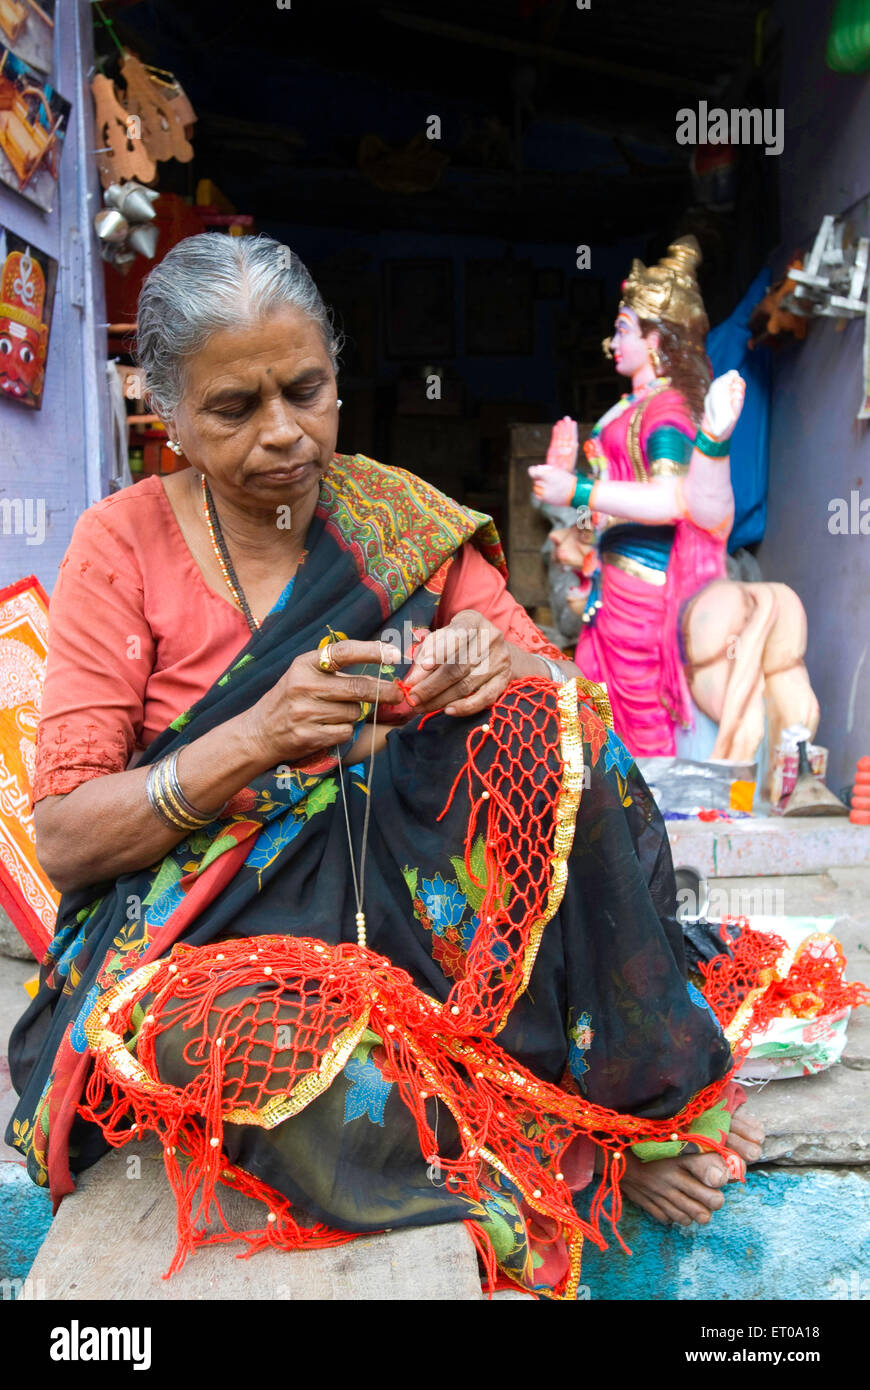 A woman weaving umbrella decorations at Bijapur ; Karnataka ; India - Stock Image